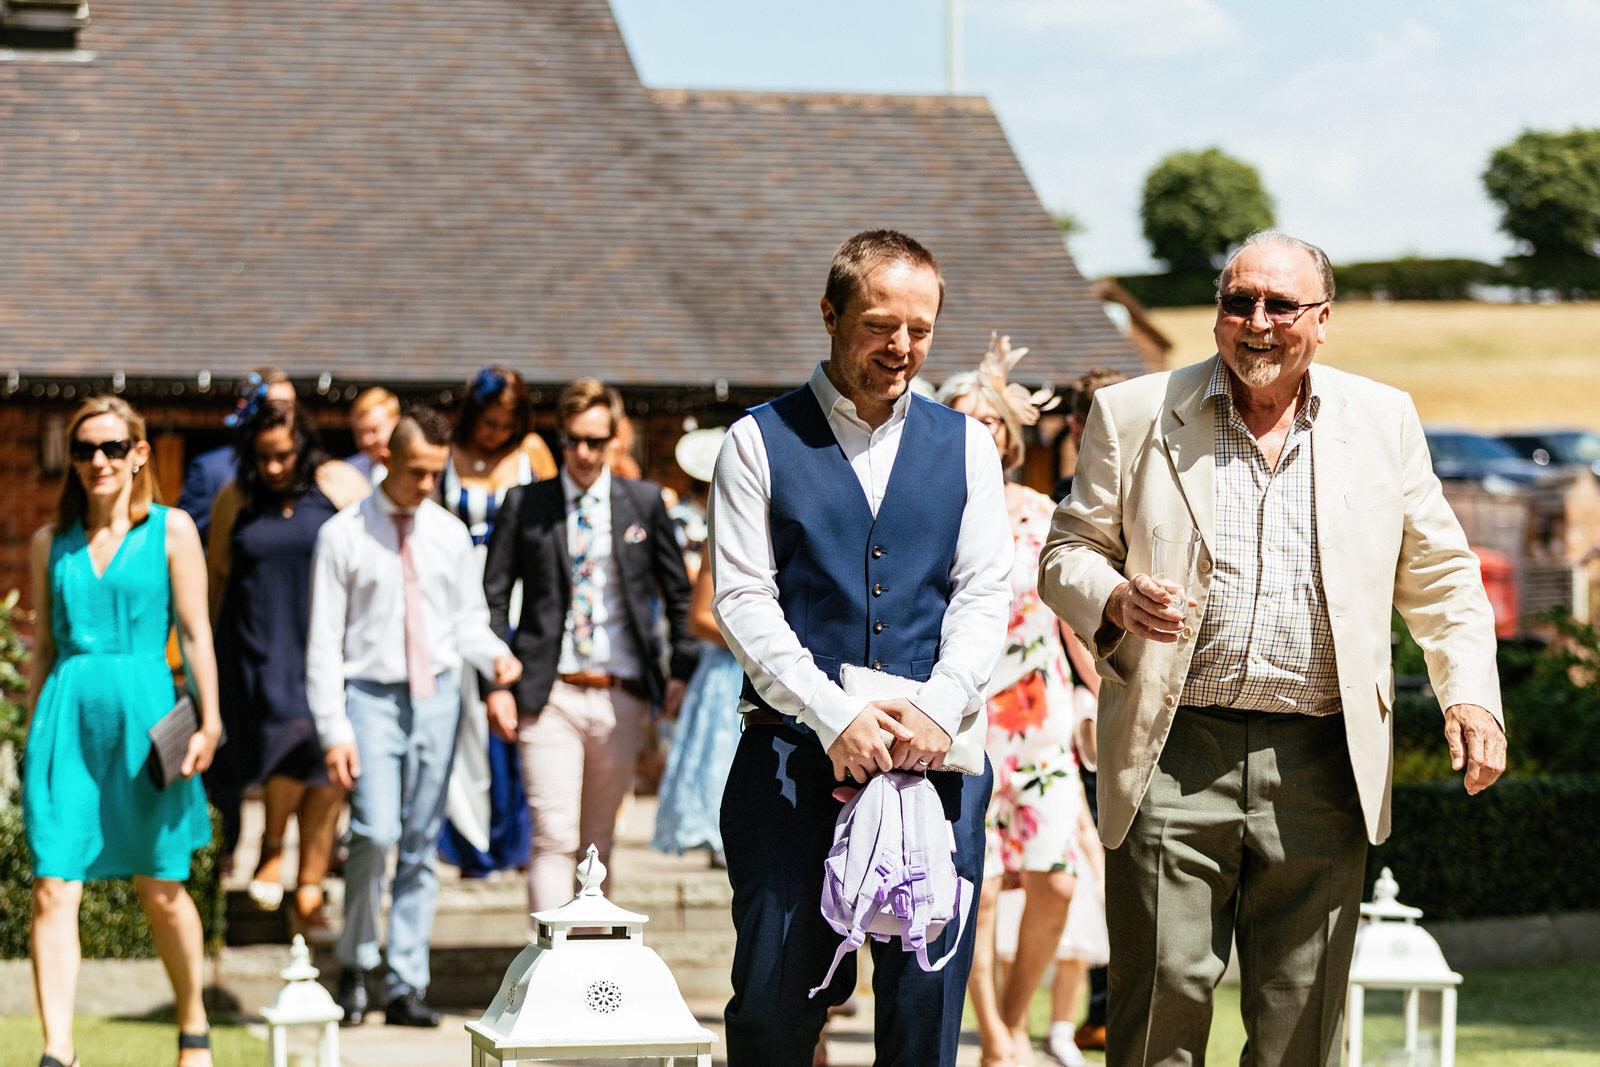 Moddershall-Oaks-Spa-Wedding-Photographer-012.jpg